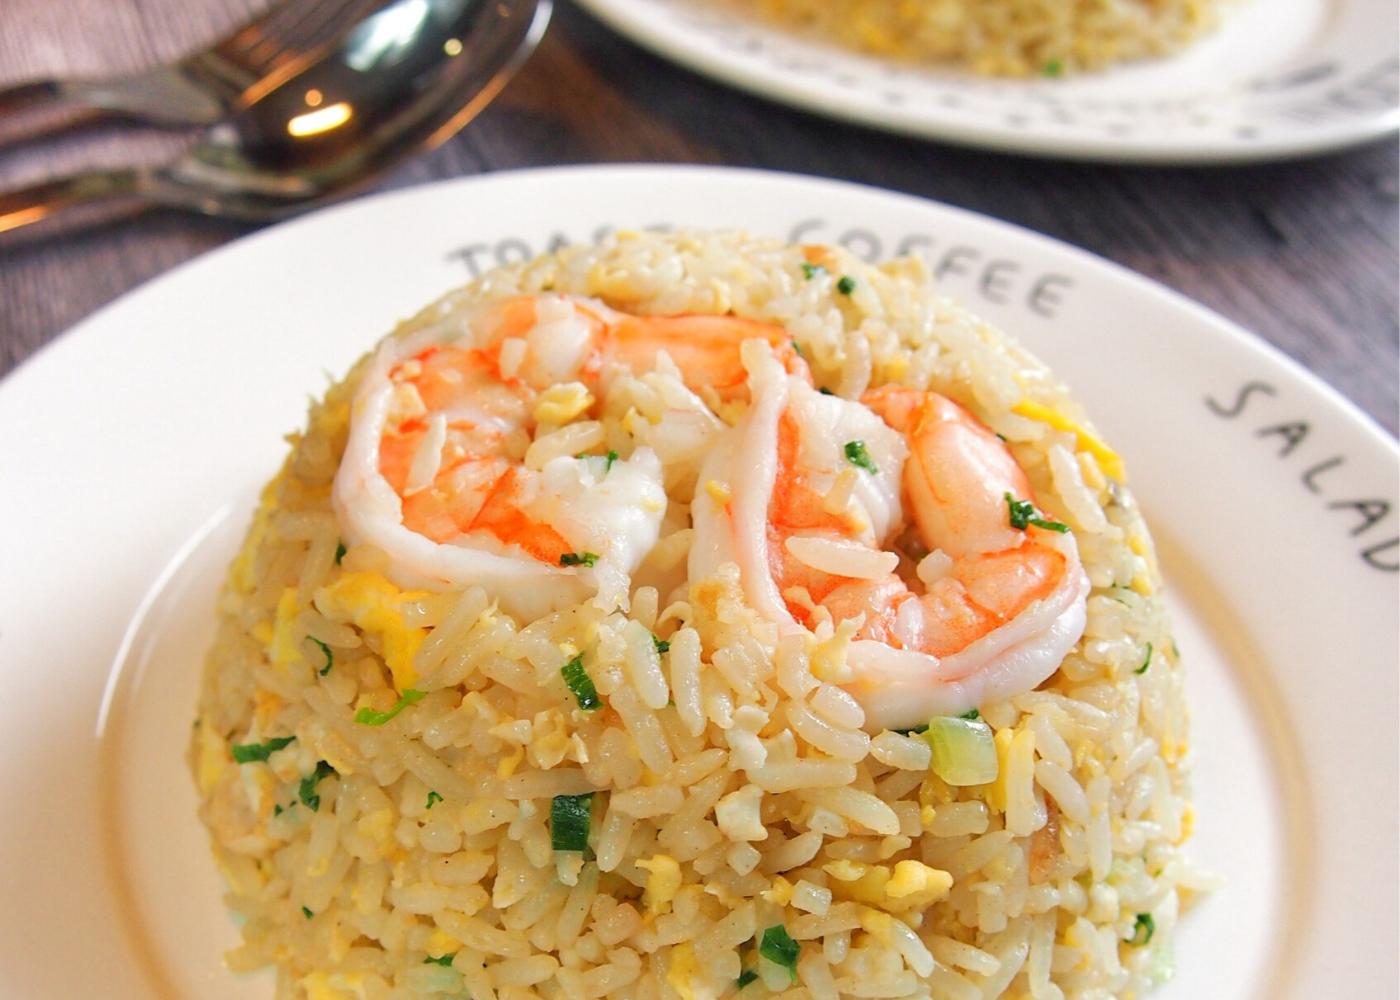 egg-and-shrimp-fried-rice-spice-n-pans